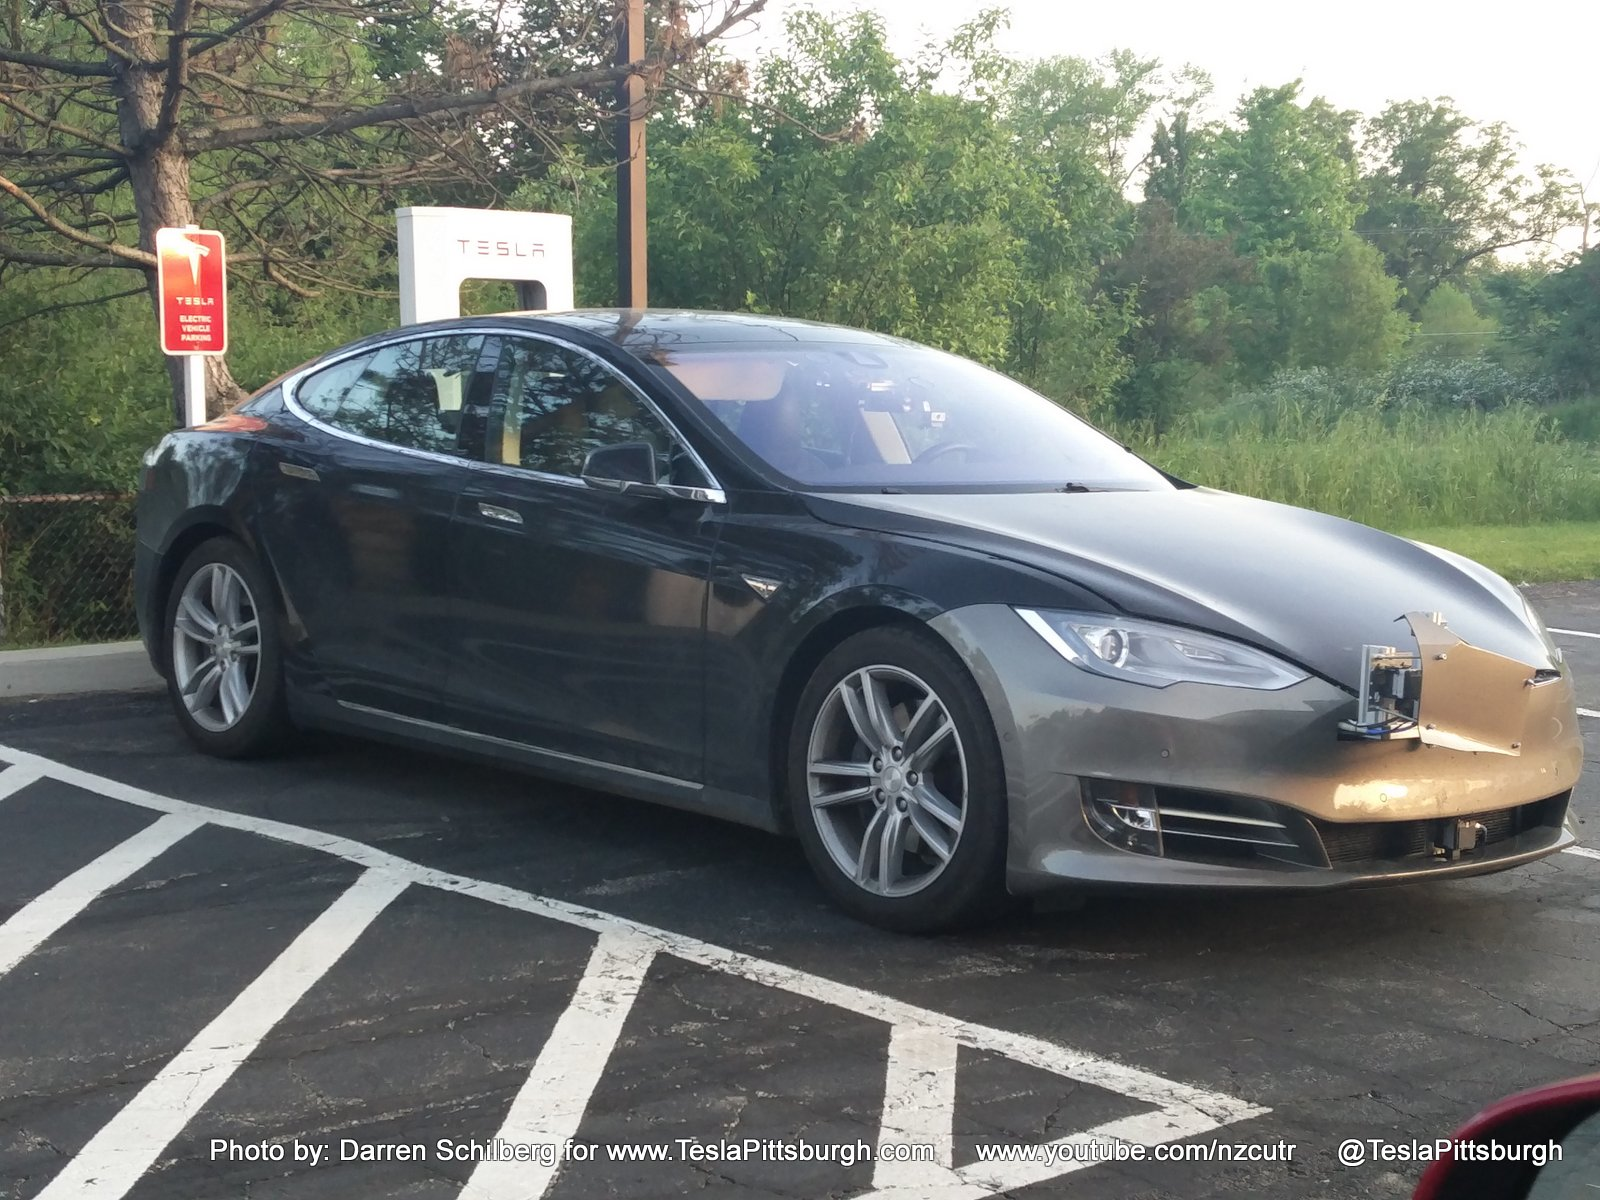 Tesla Model S Mule With Autopilot 2 0 Sensors